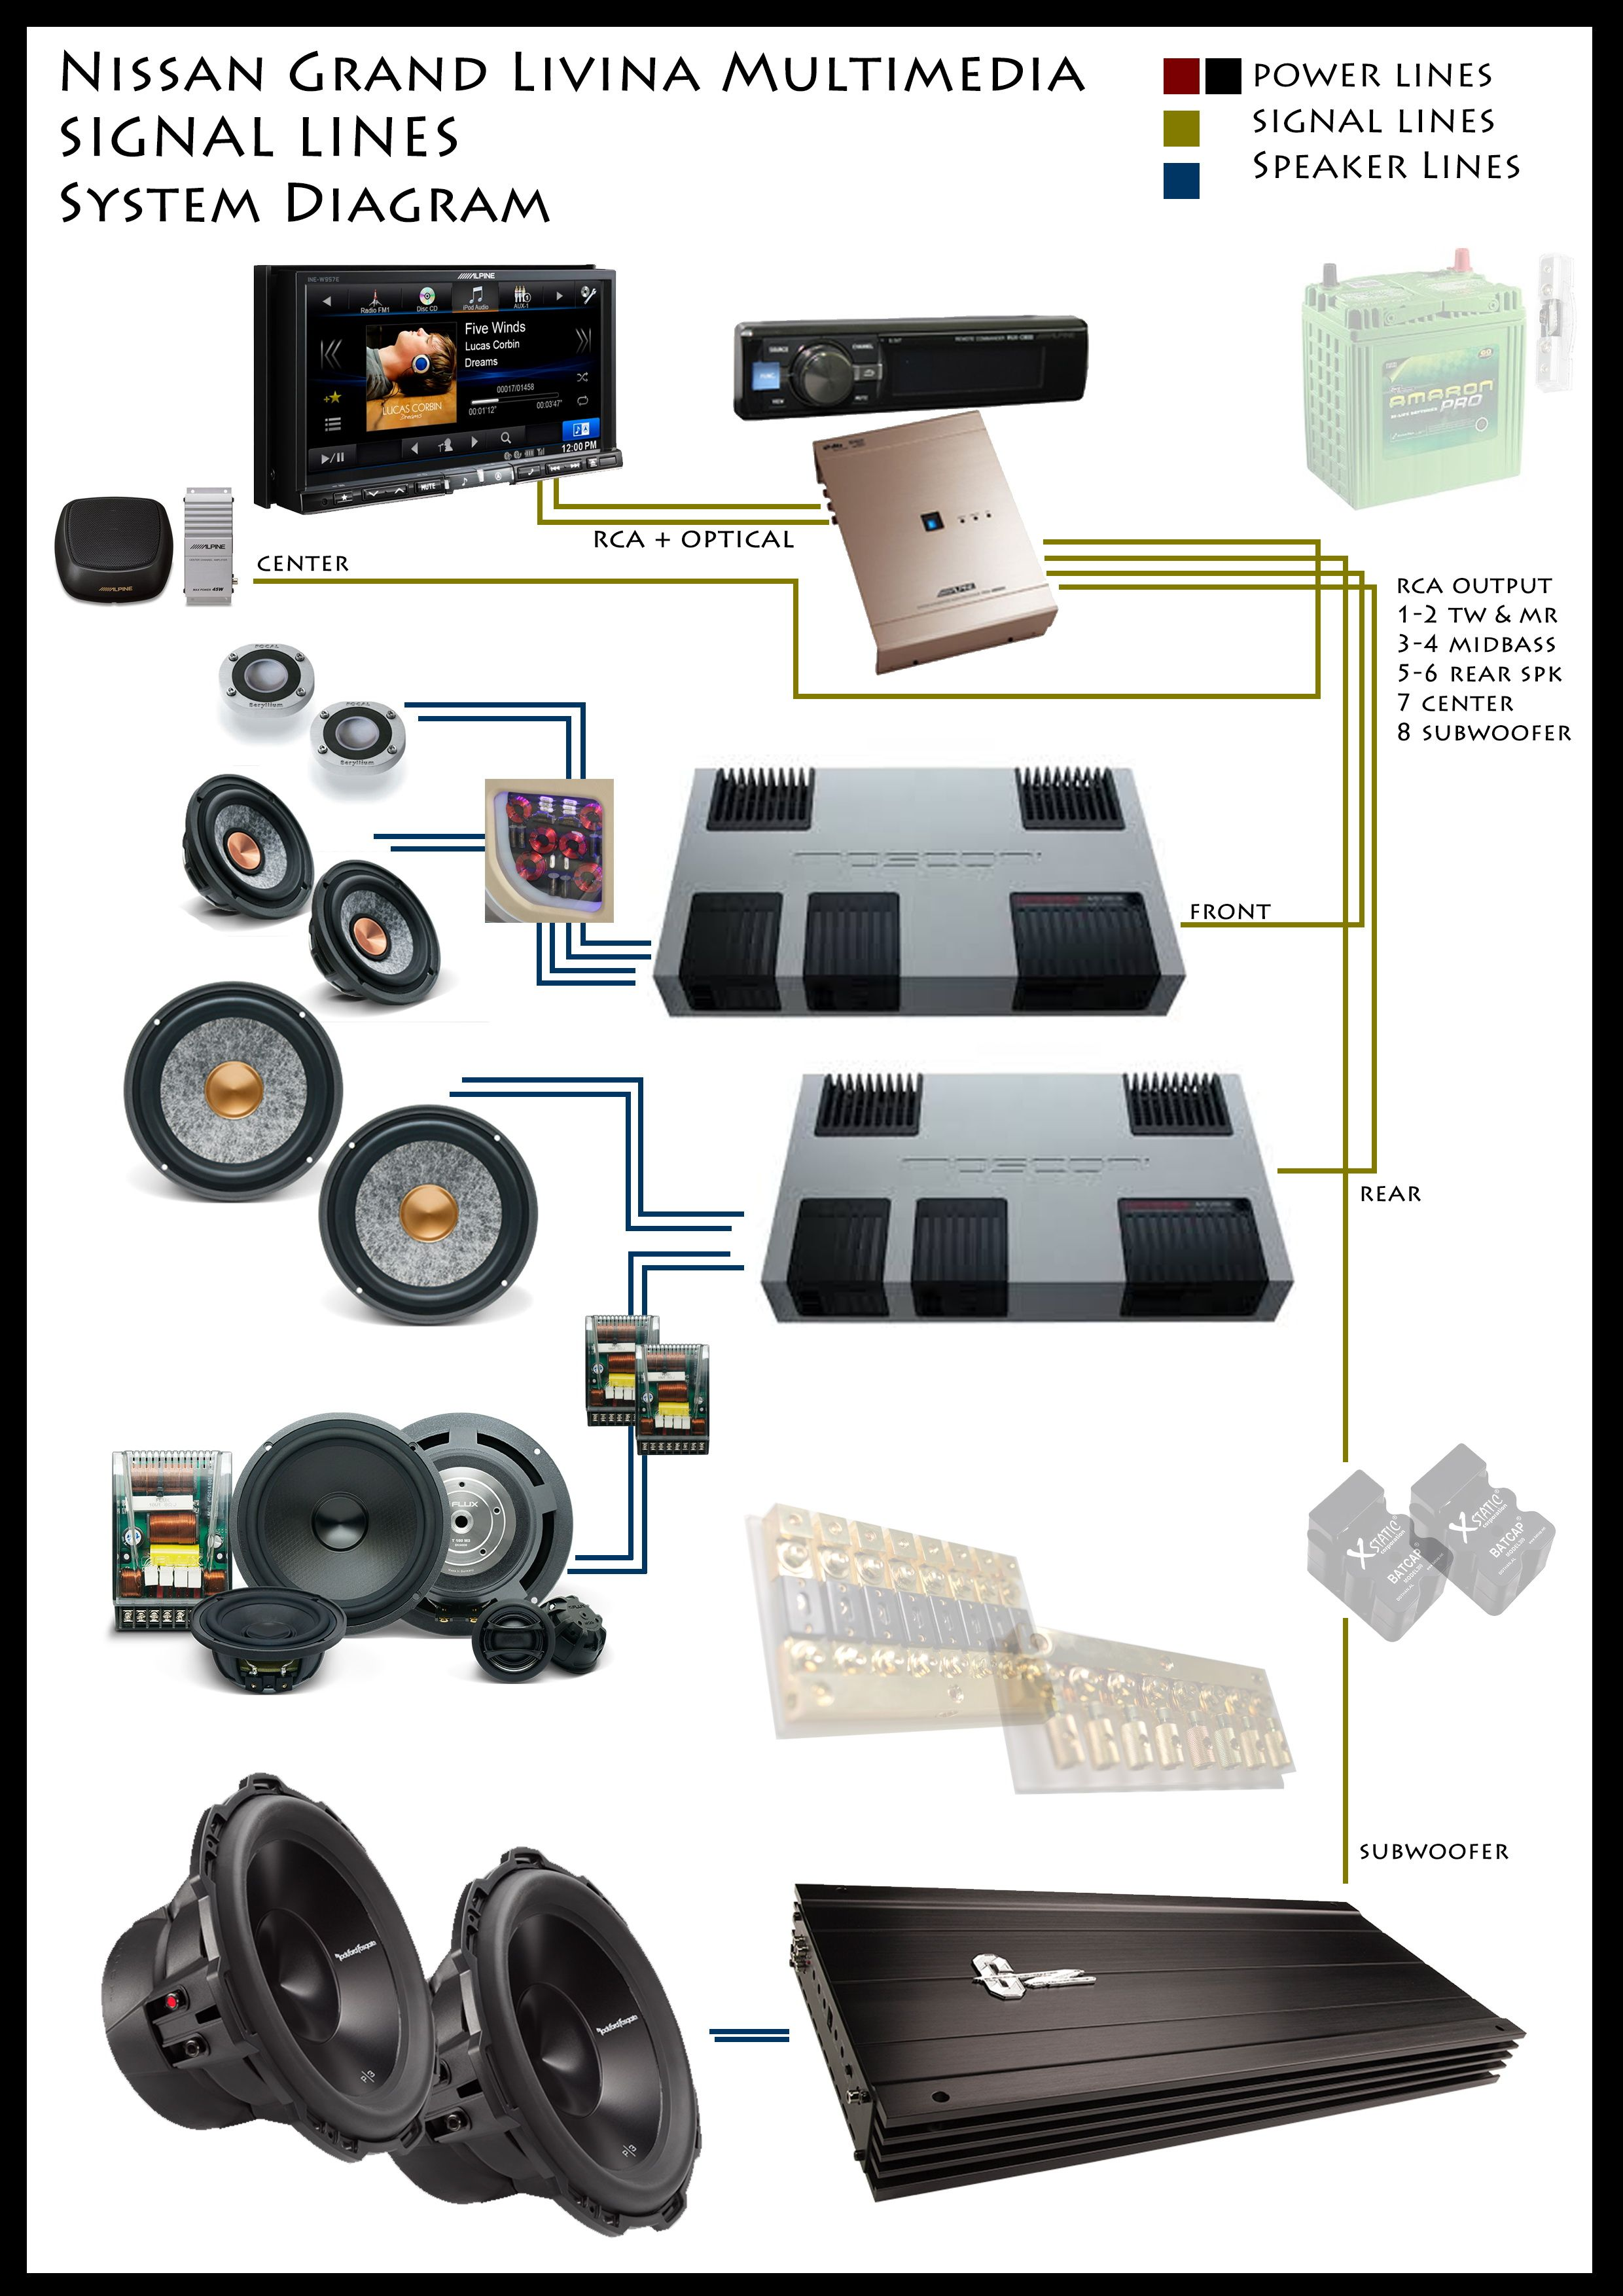 medium resolution of nissan grand livina emma champions multimedia 5 1 class by www cartens audio com